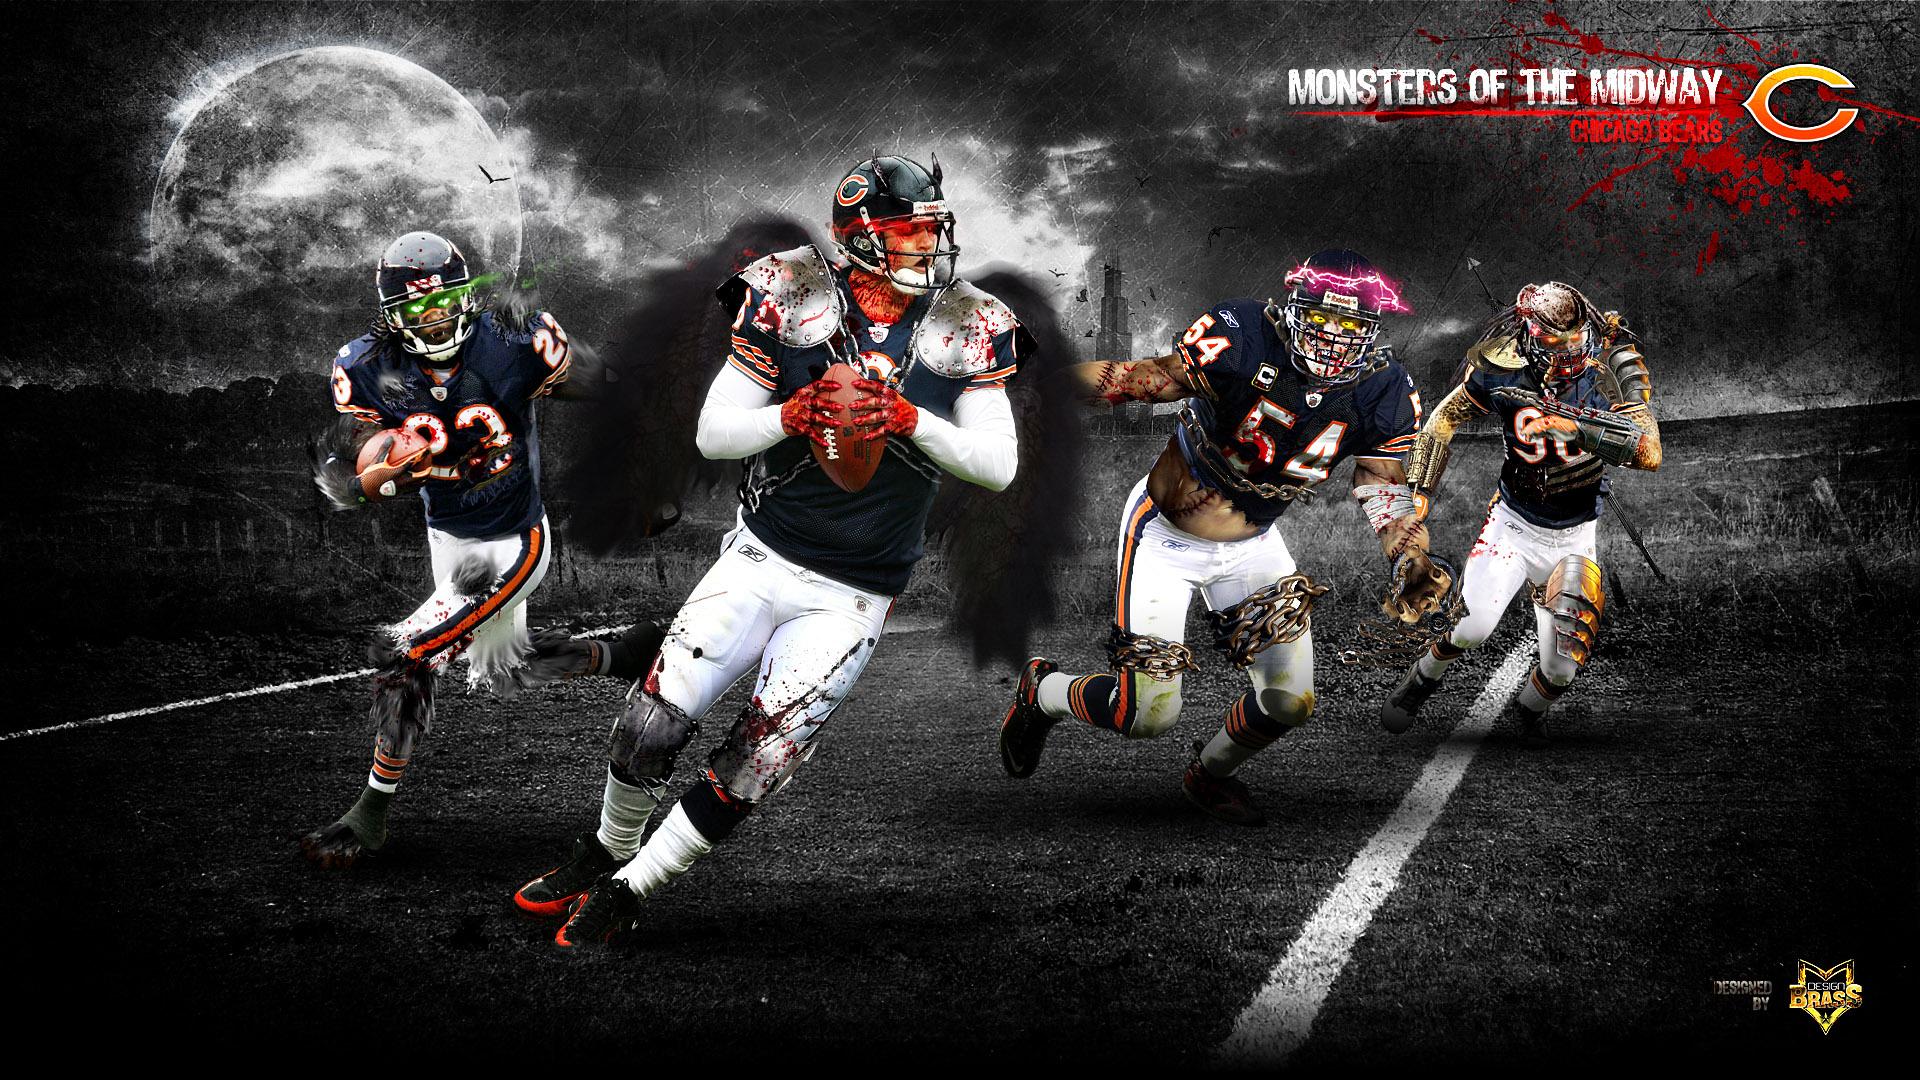 CHICAGO BEARS nfl football j wallpaper 1920x1080 156158 1920x1080 fa3a48085